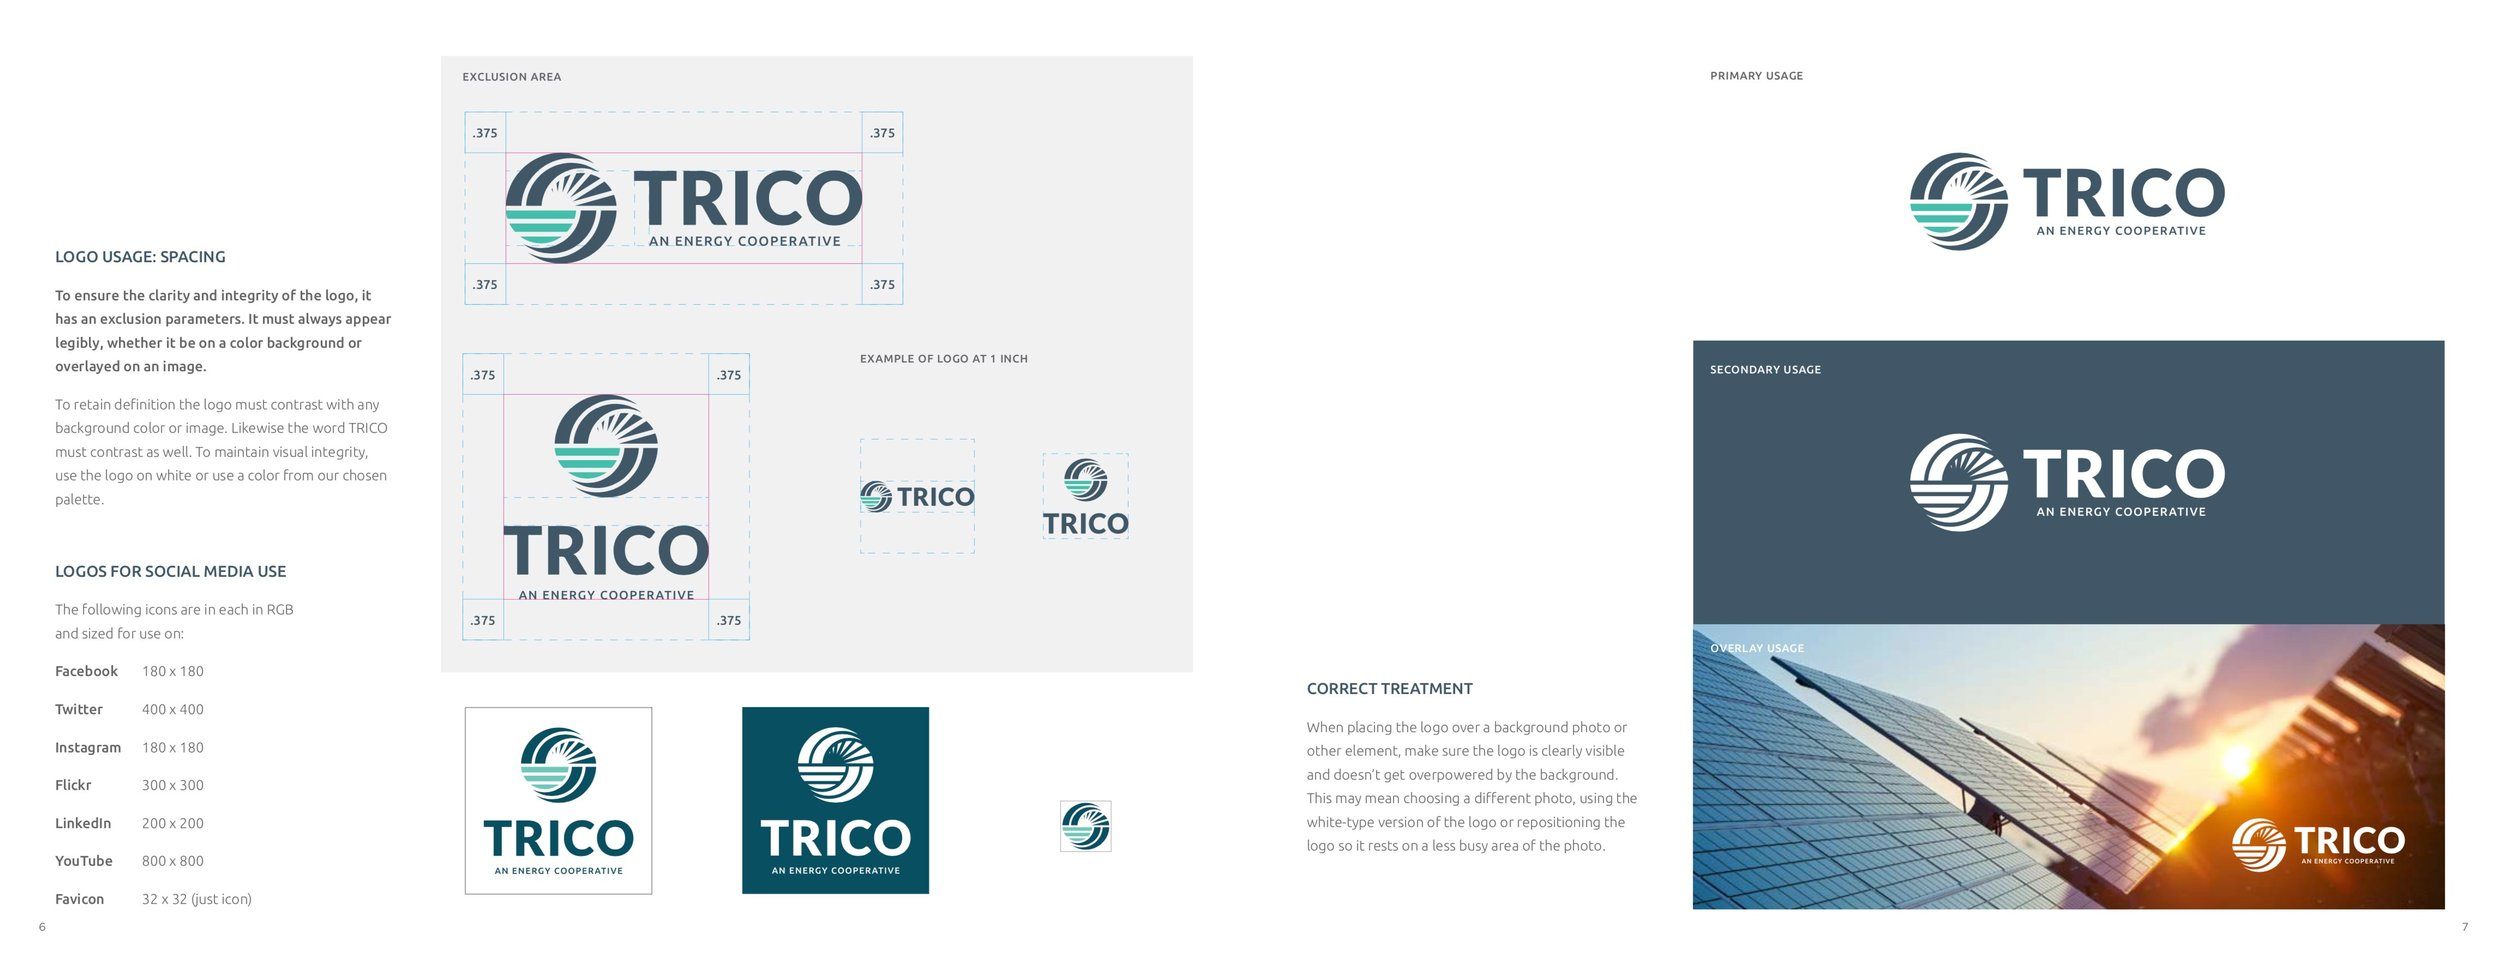 trico-brand-guidelines-1.jpg